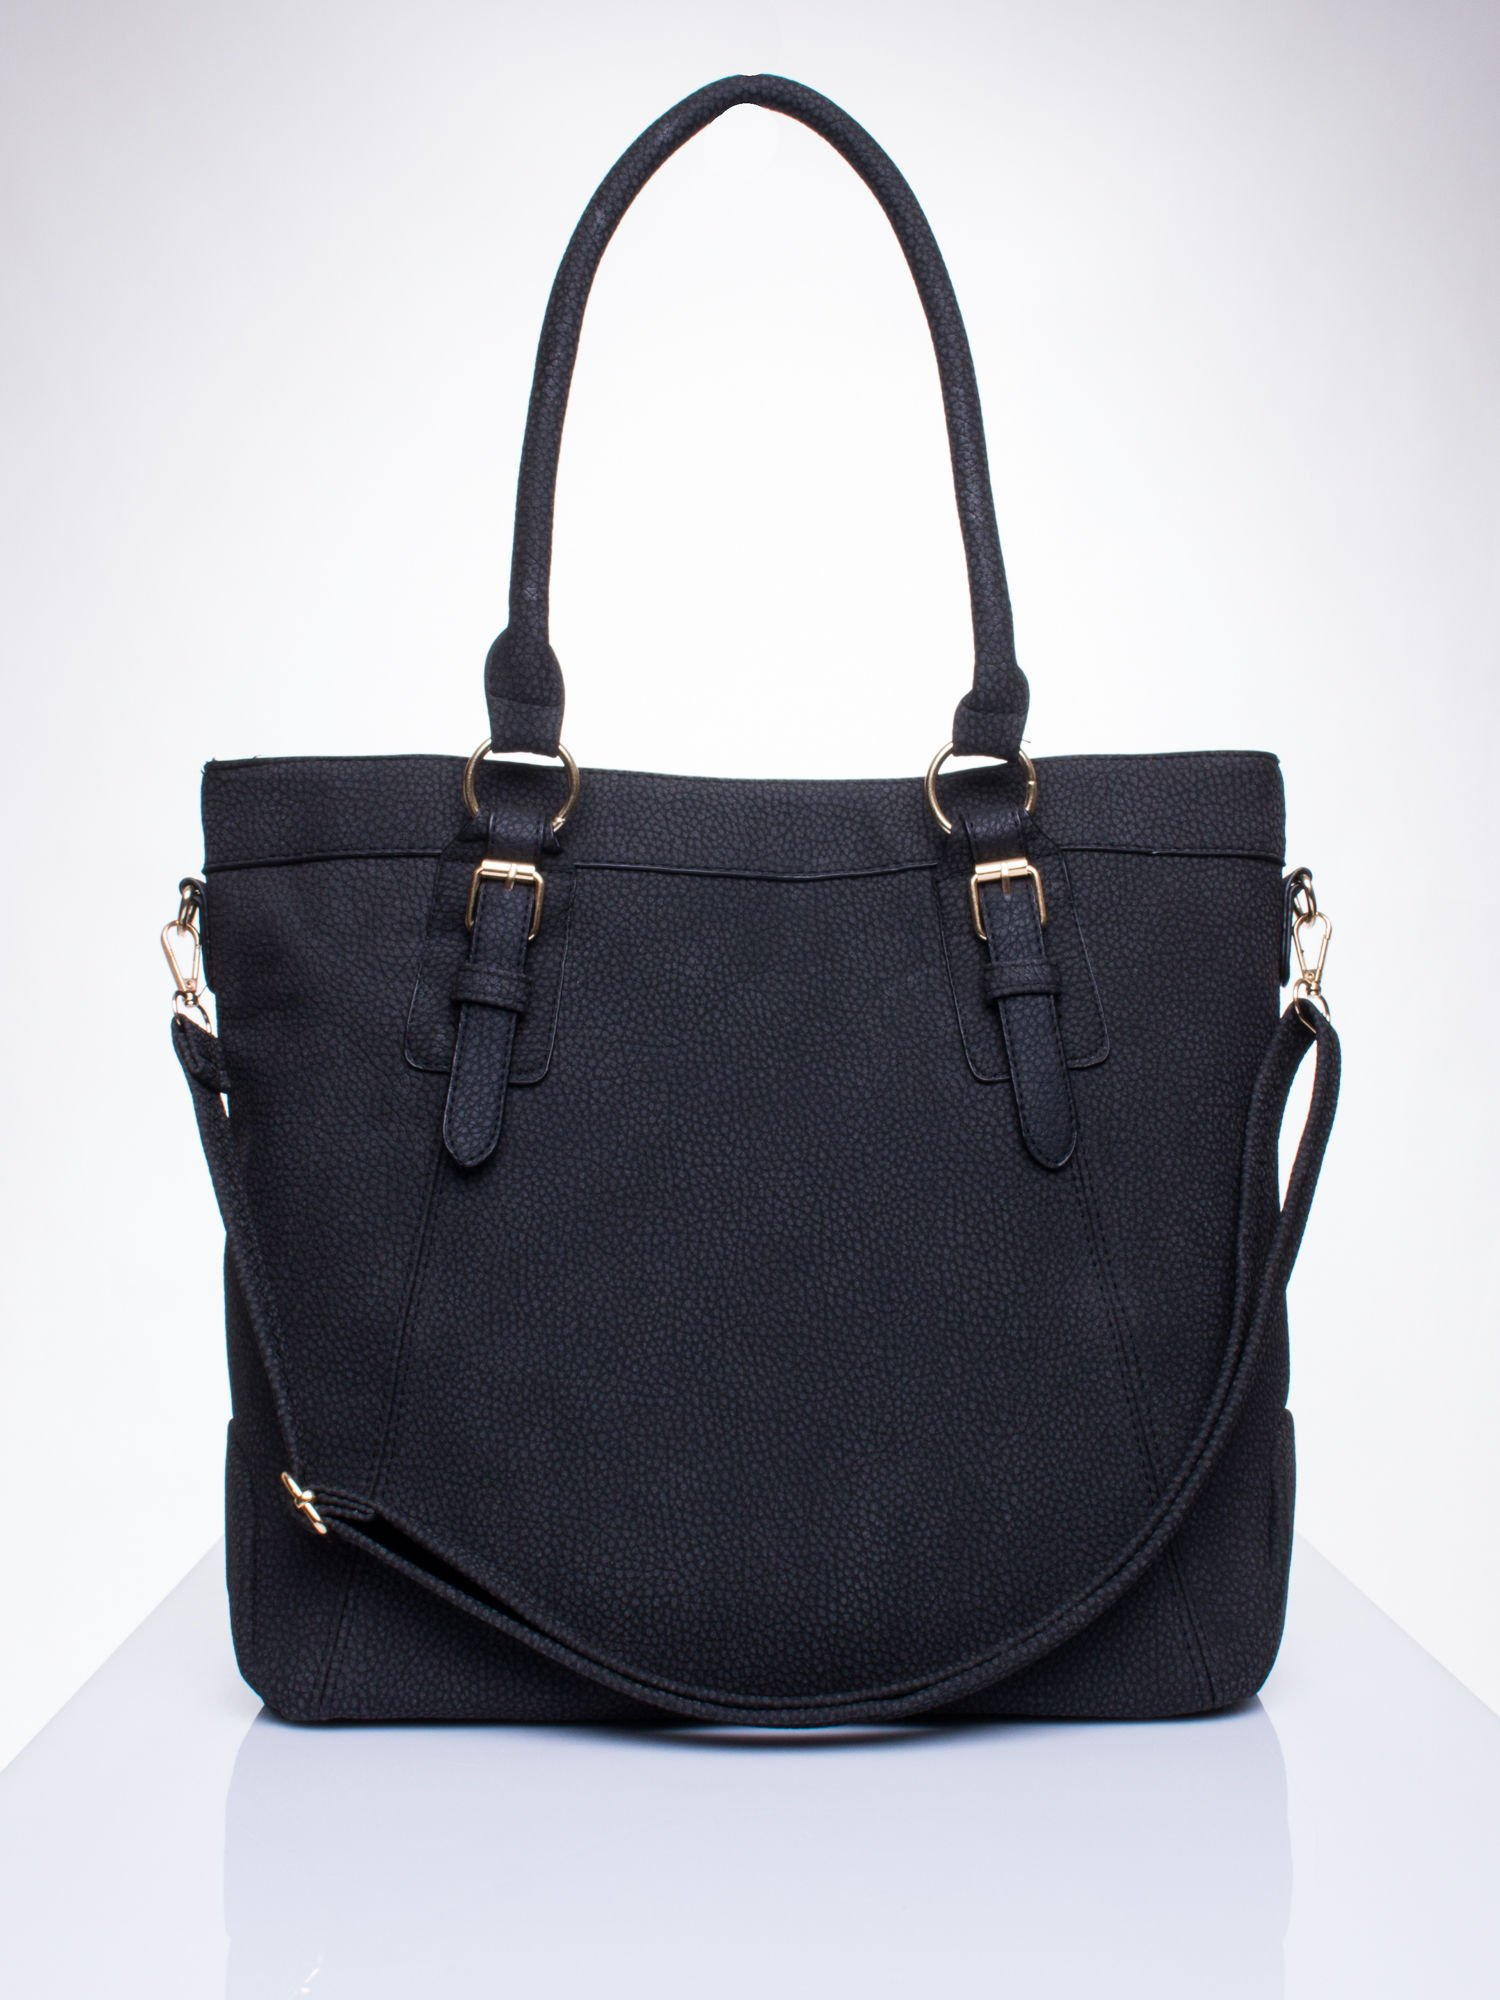 Czarna fakturowana torebka z klamerkami                                  zdj.                                  1